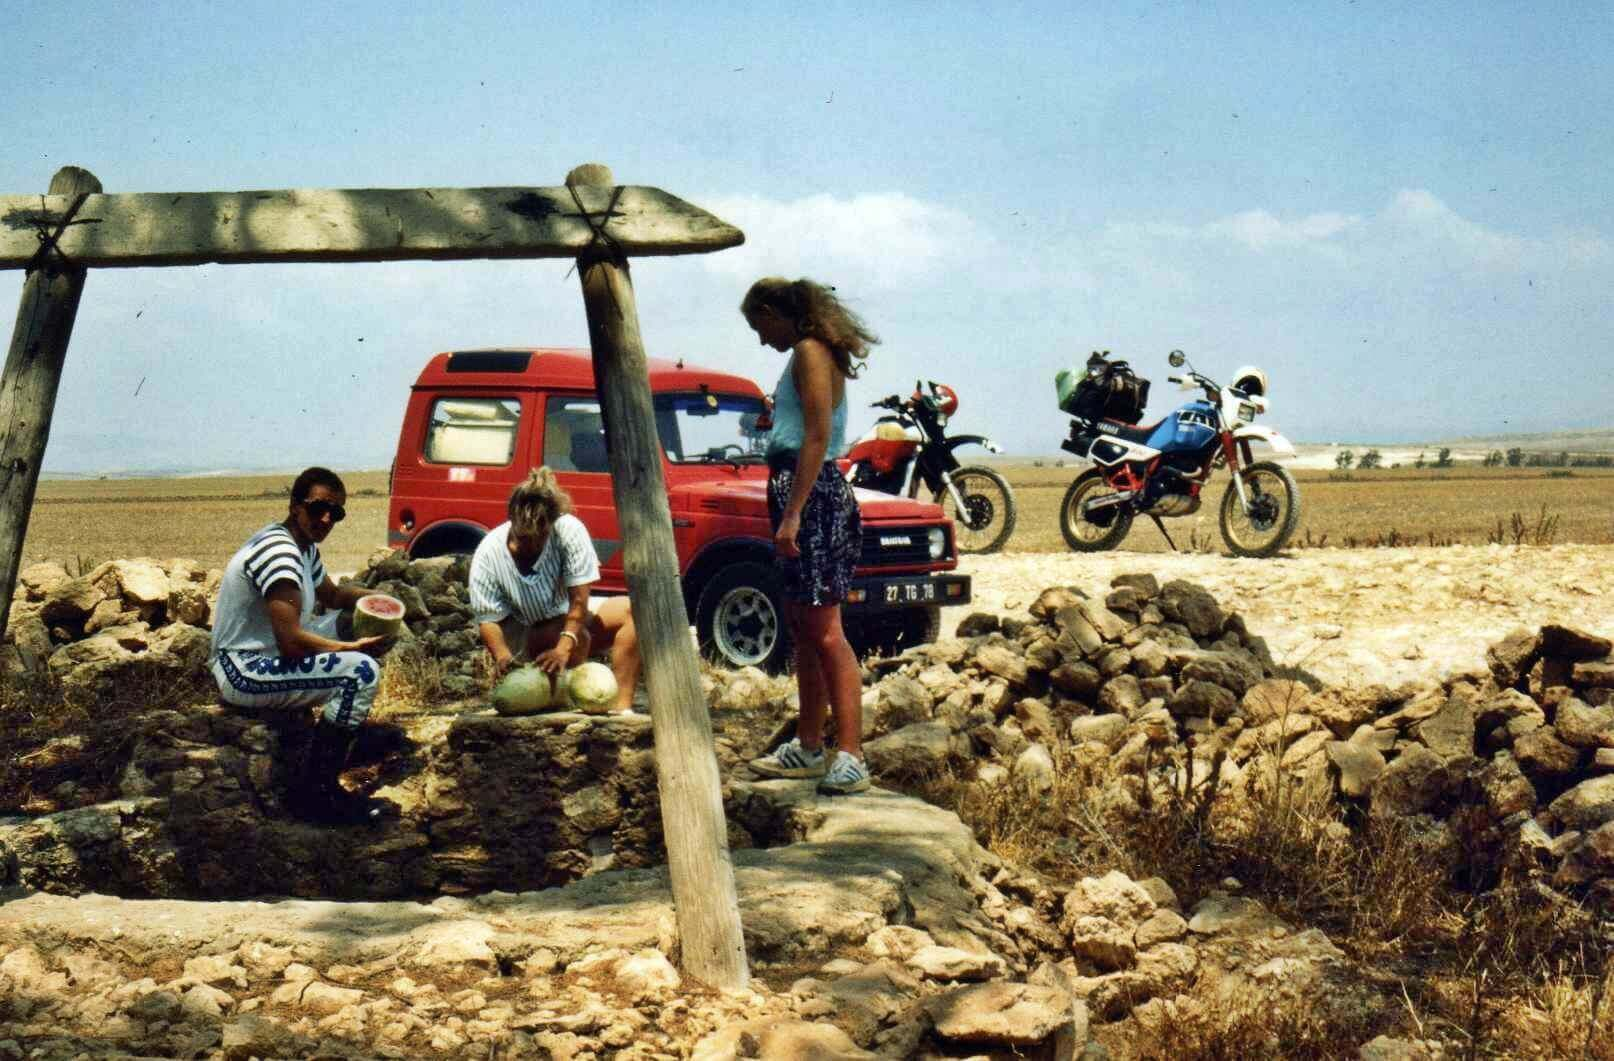 Raid moto 4x4 Tunisie Tunis Djerba Wild Spot